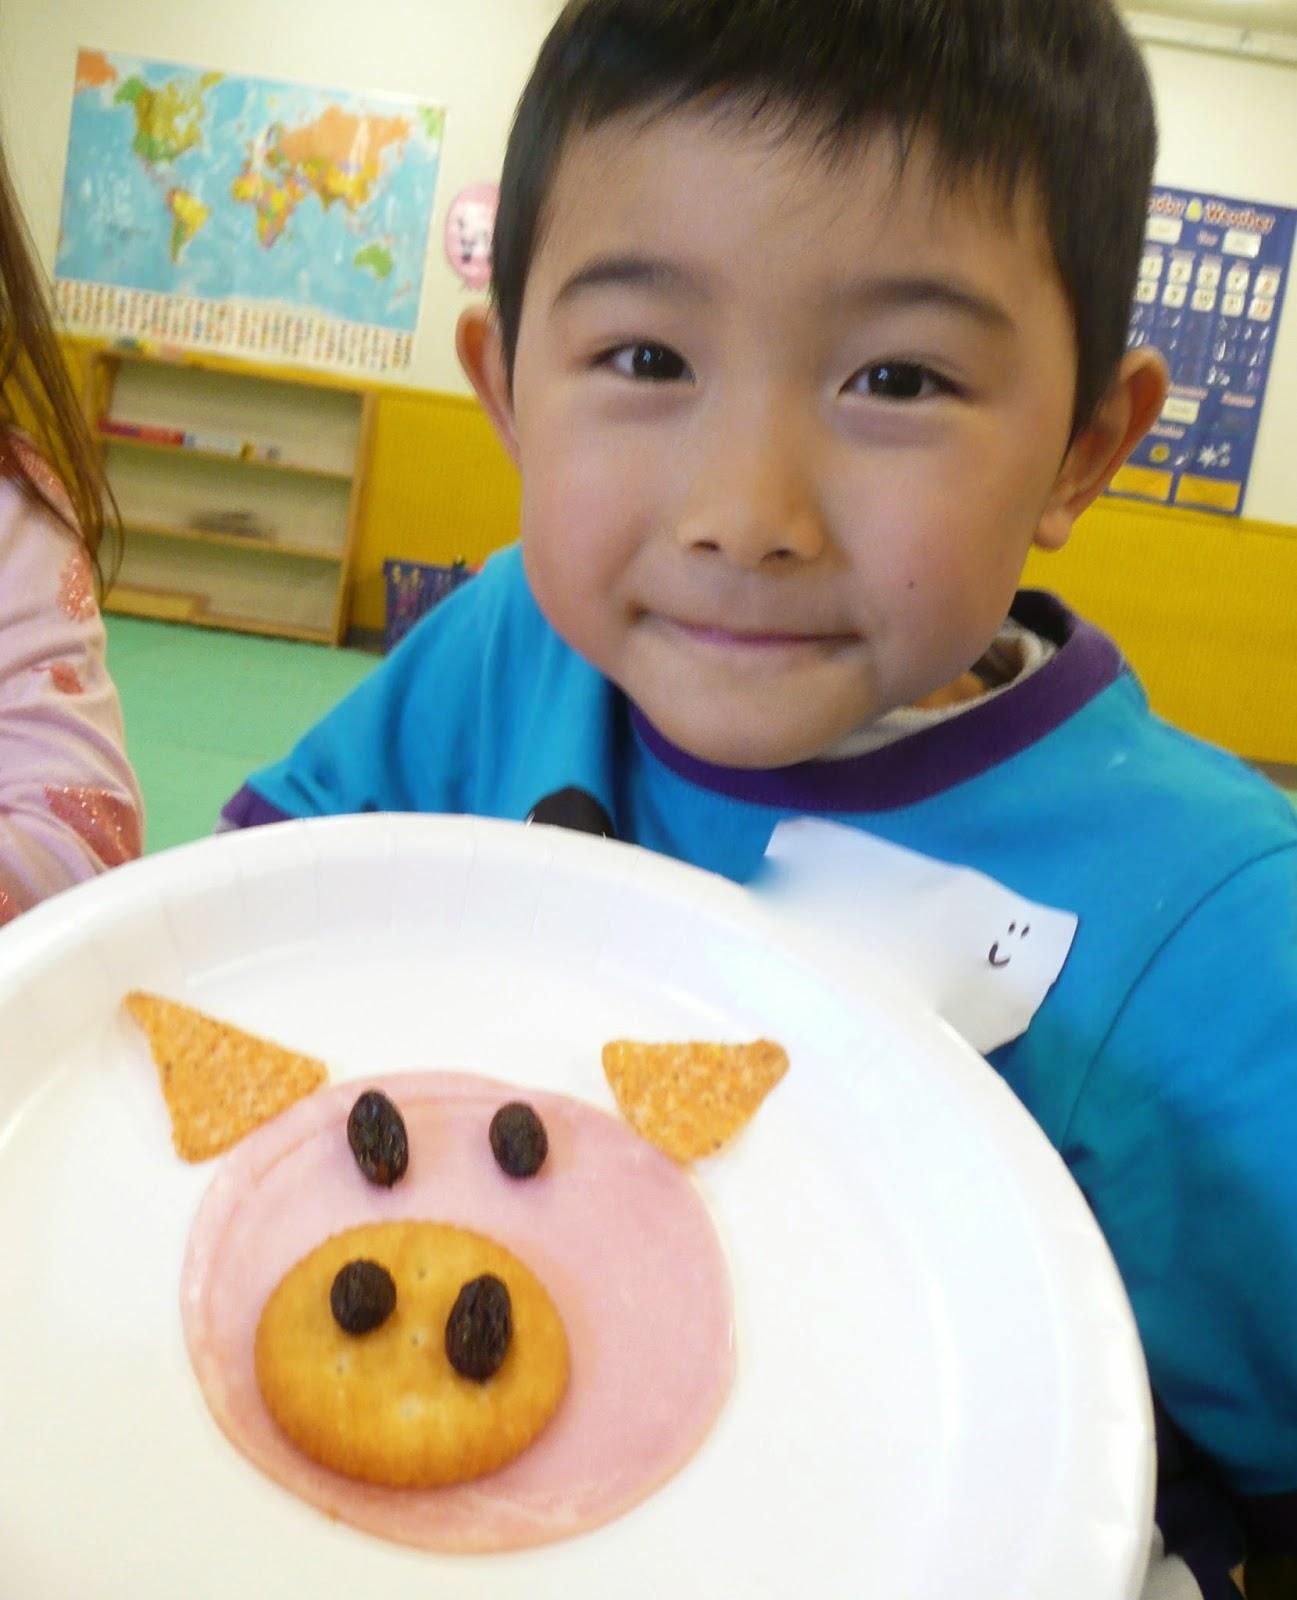 farm animal snacks for preschoolers new international school pig snack for preschoolers 905